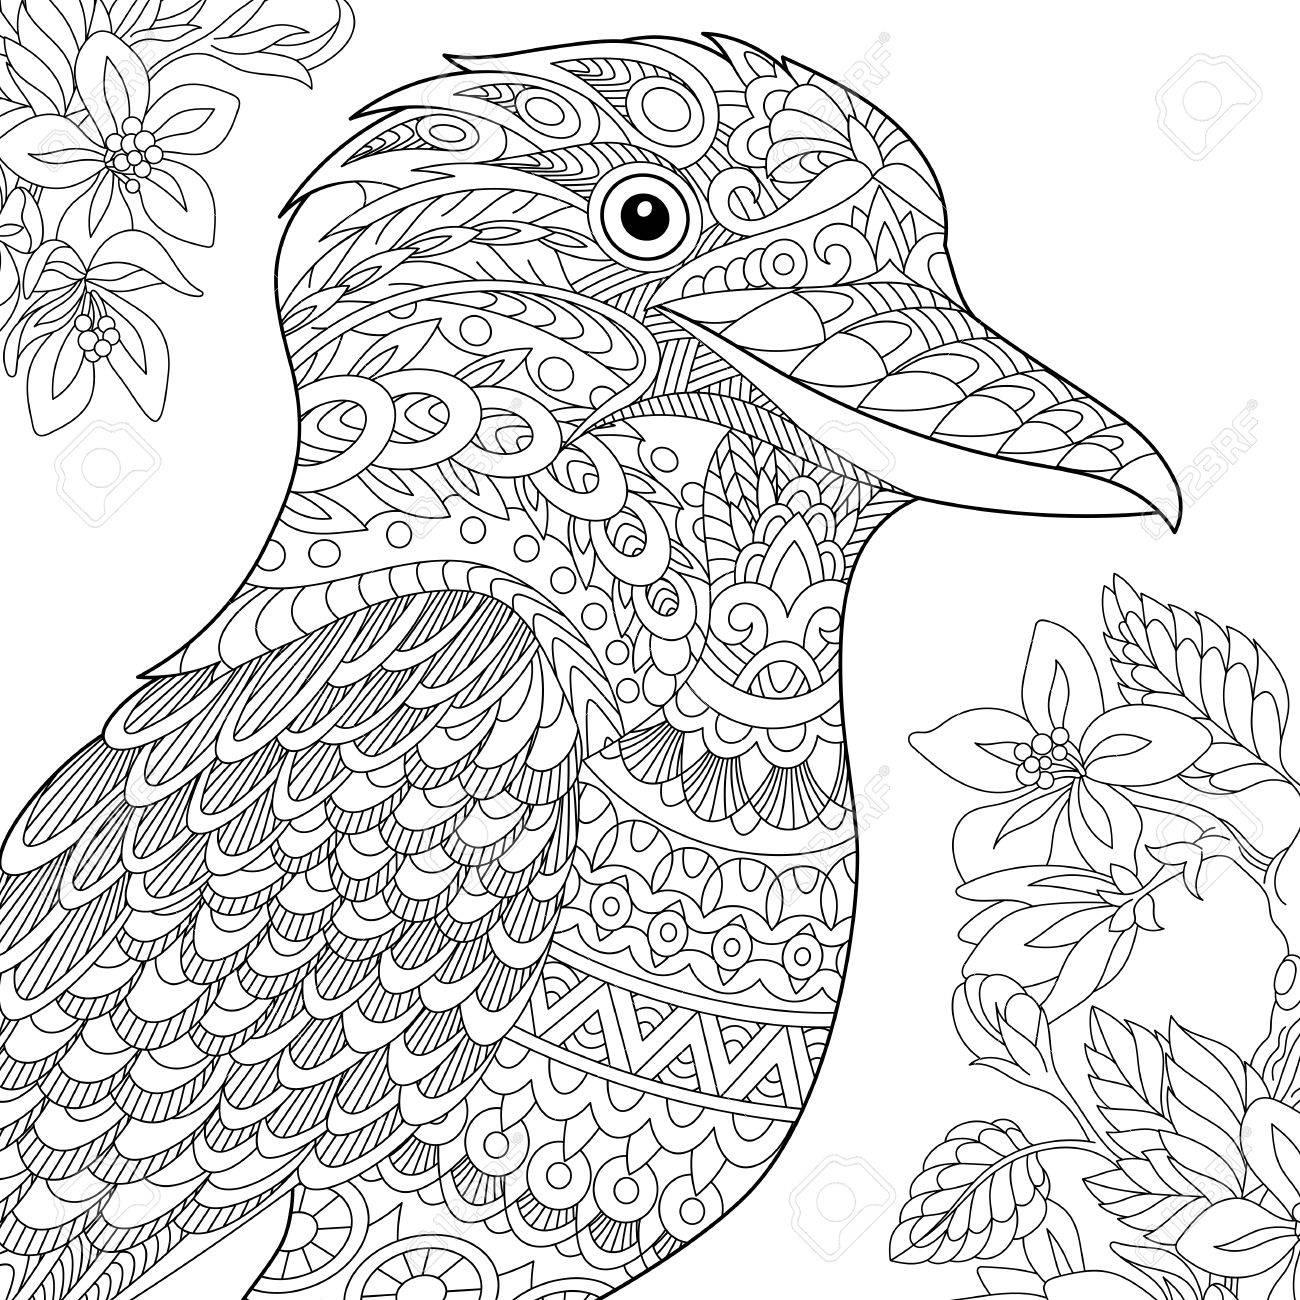 1300x1300 Coloring Page. Australian Kookaburra Bird. Freehand Sketch Drawing